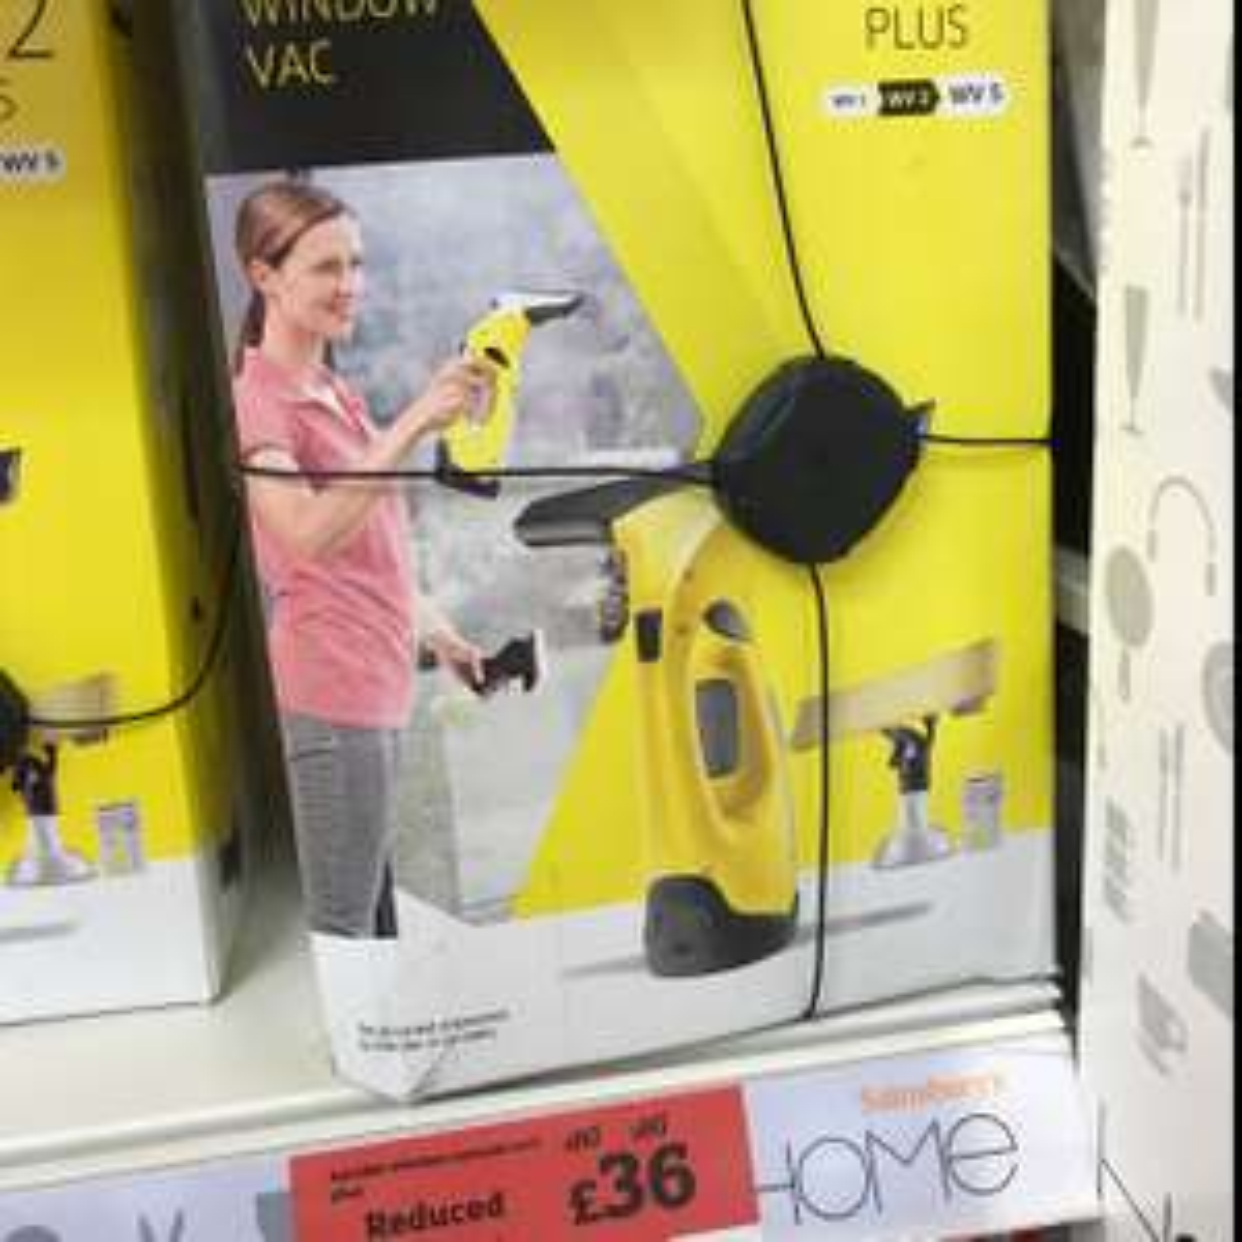 Karcher WV2 window vac £36 (Sainsbury's)